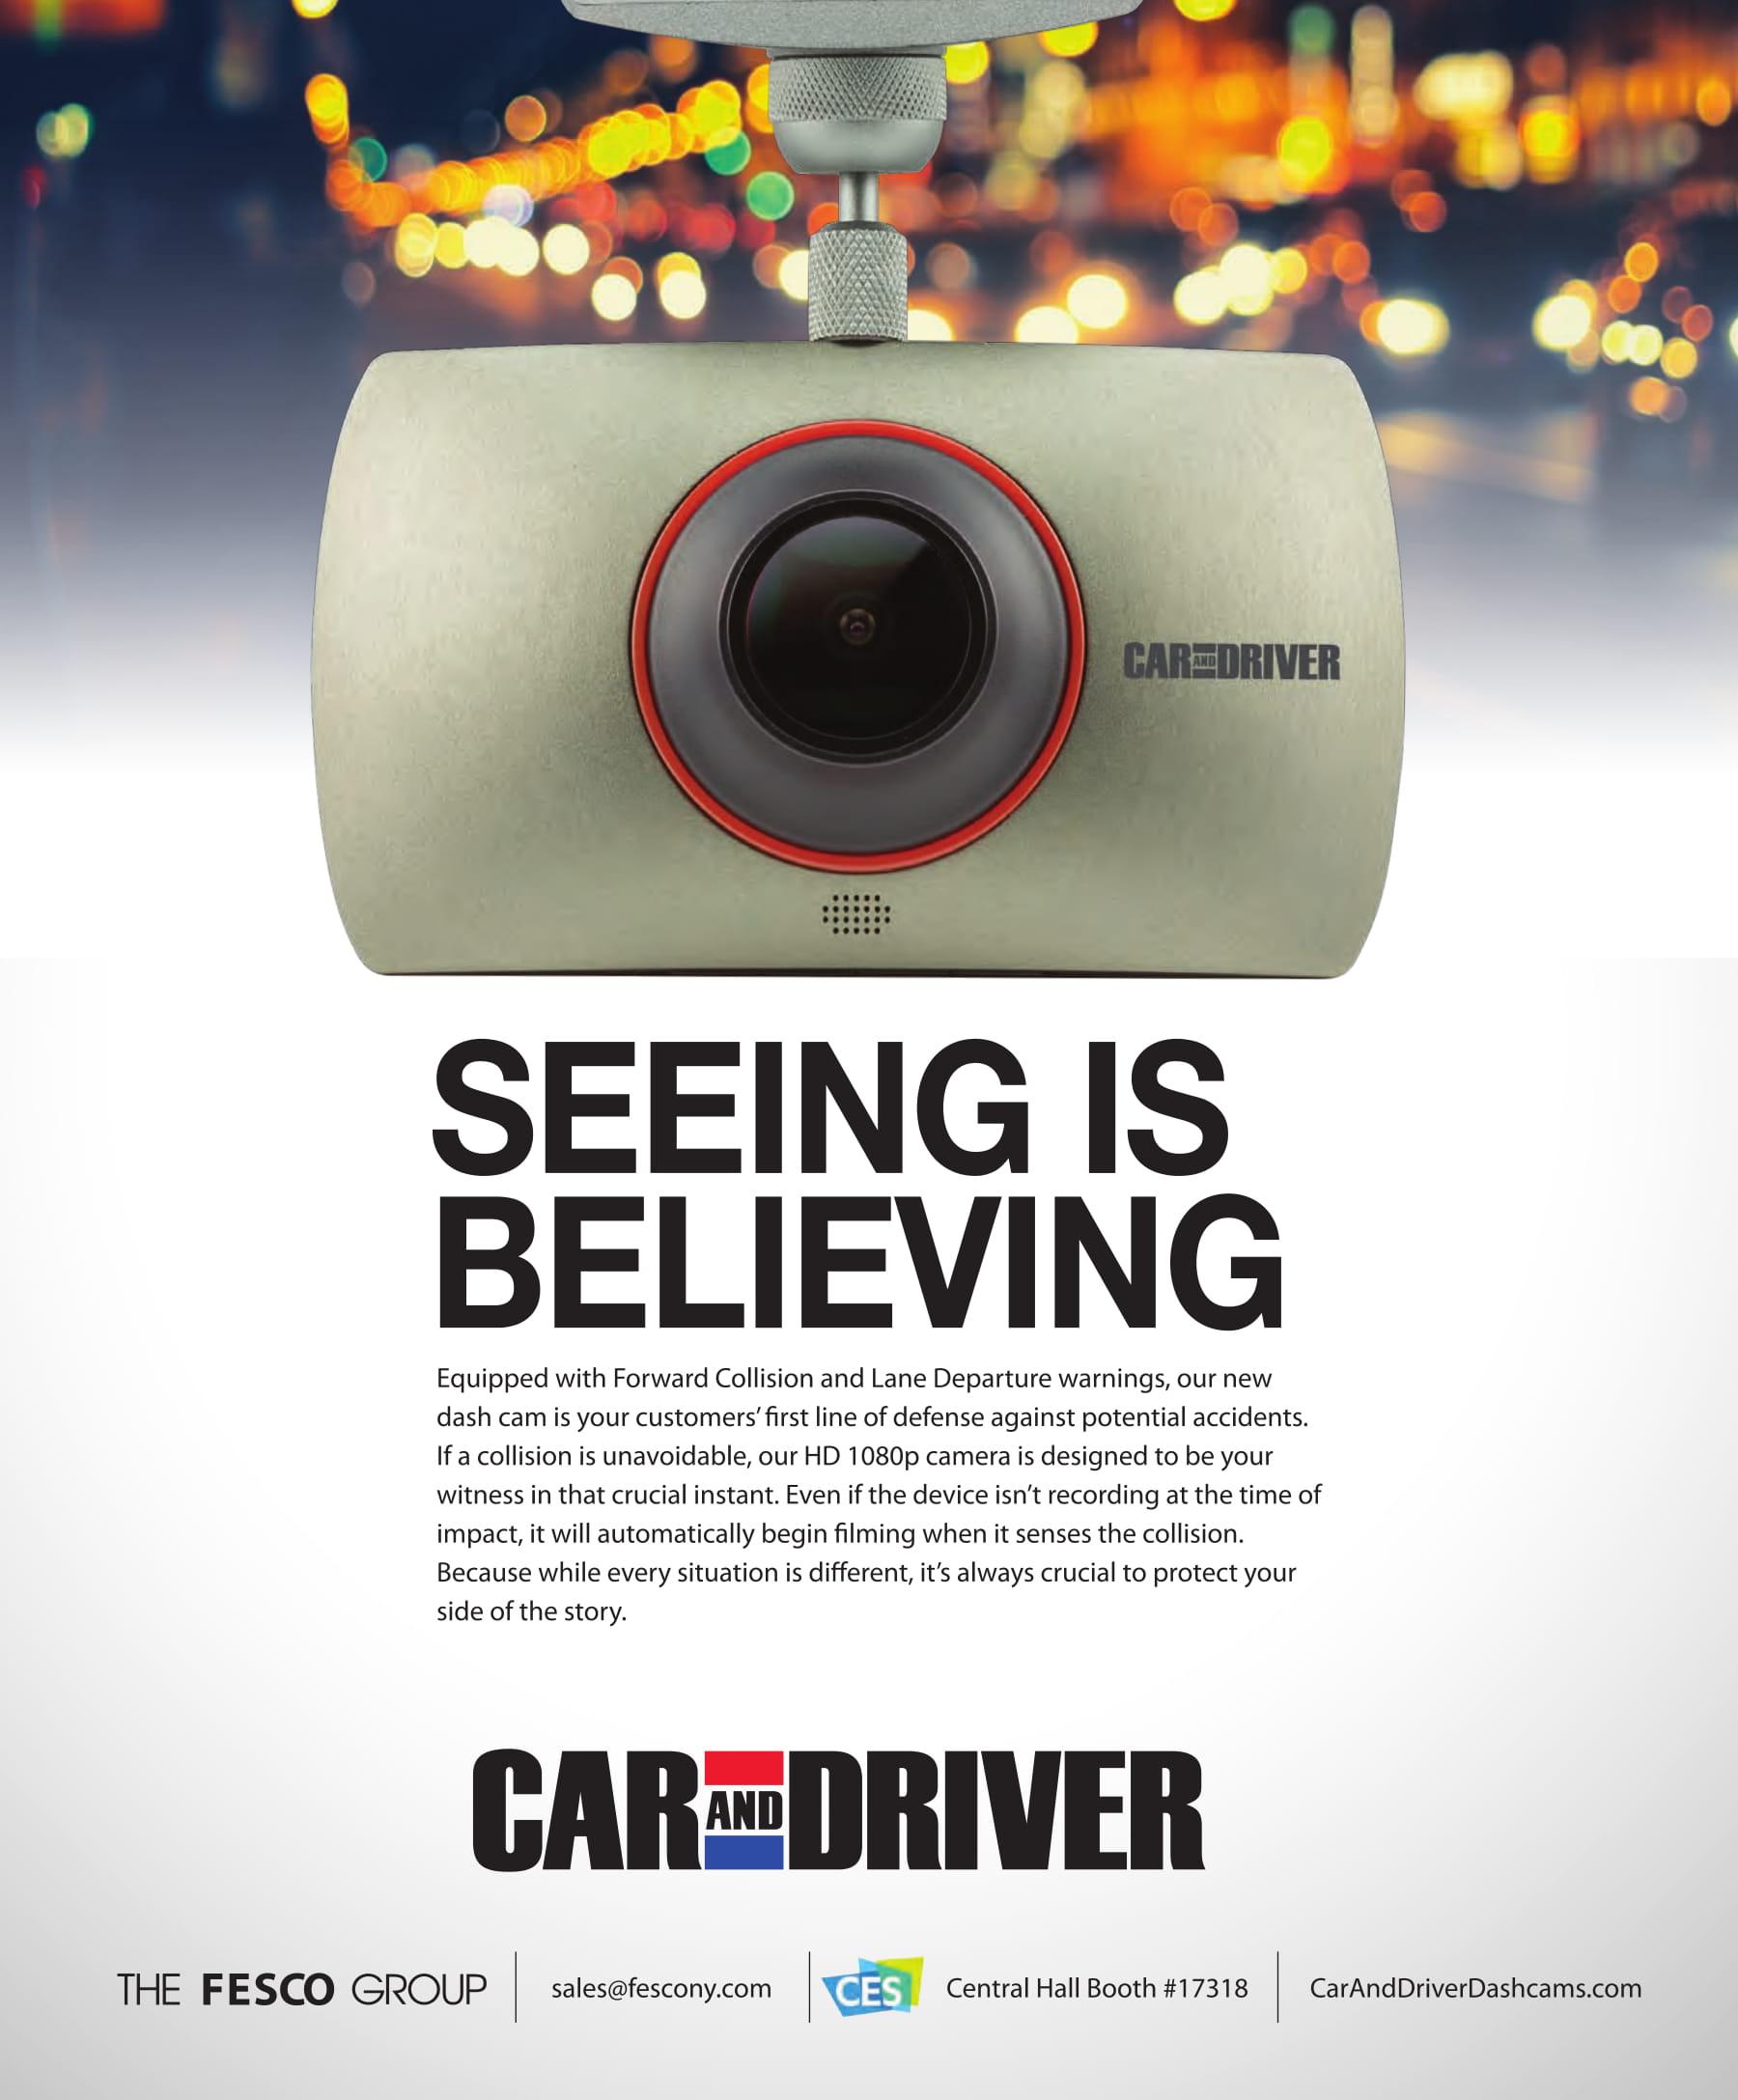 caranddriver1-1.jpg